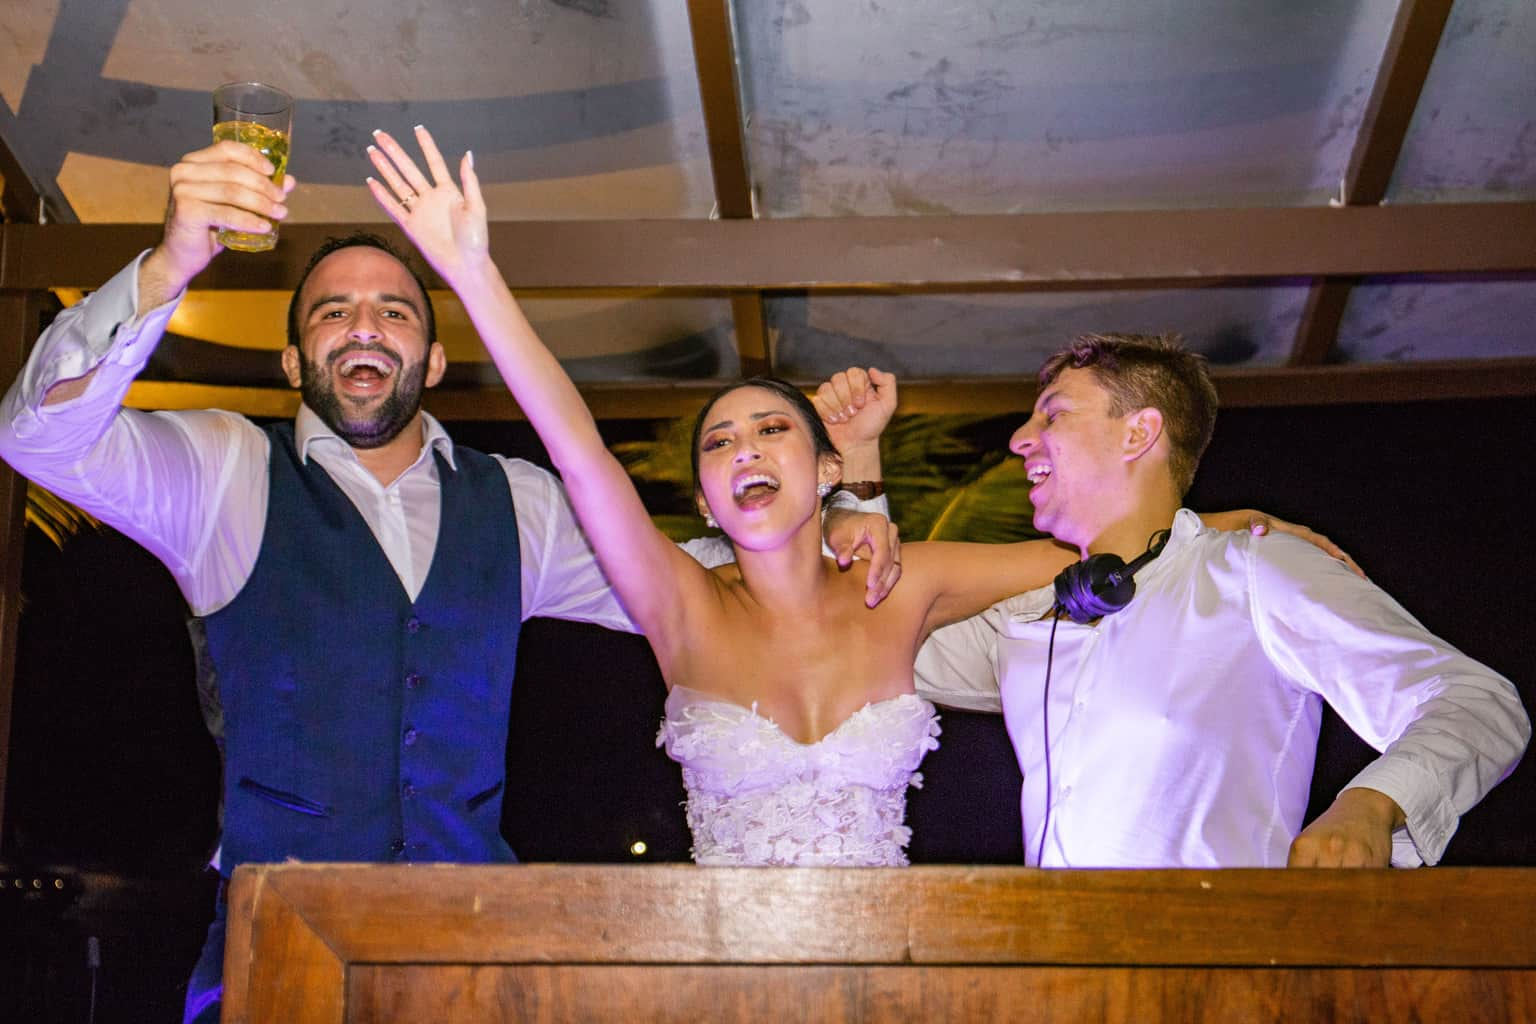 Casamento-Alissa-e-Gustavo-Cerimonial-Manu-Goncalez-Decor-Andrea-Kapps-Fasano-Angra-dos-Reis-Foto-VRebel-DJ-Jimmy-festa5470